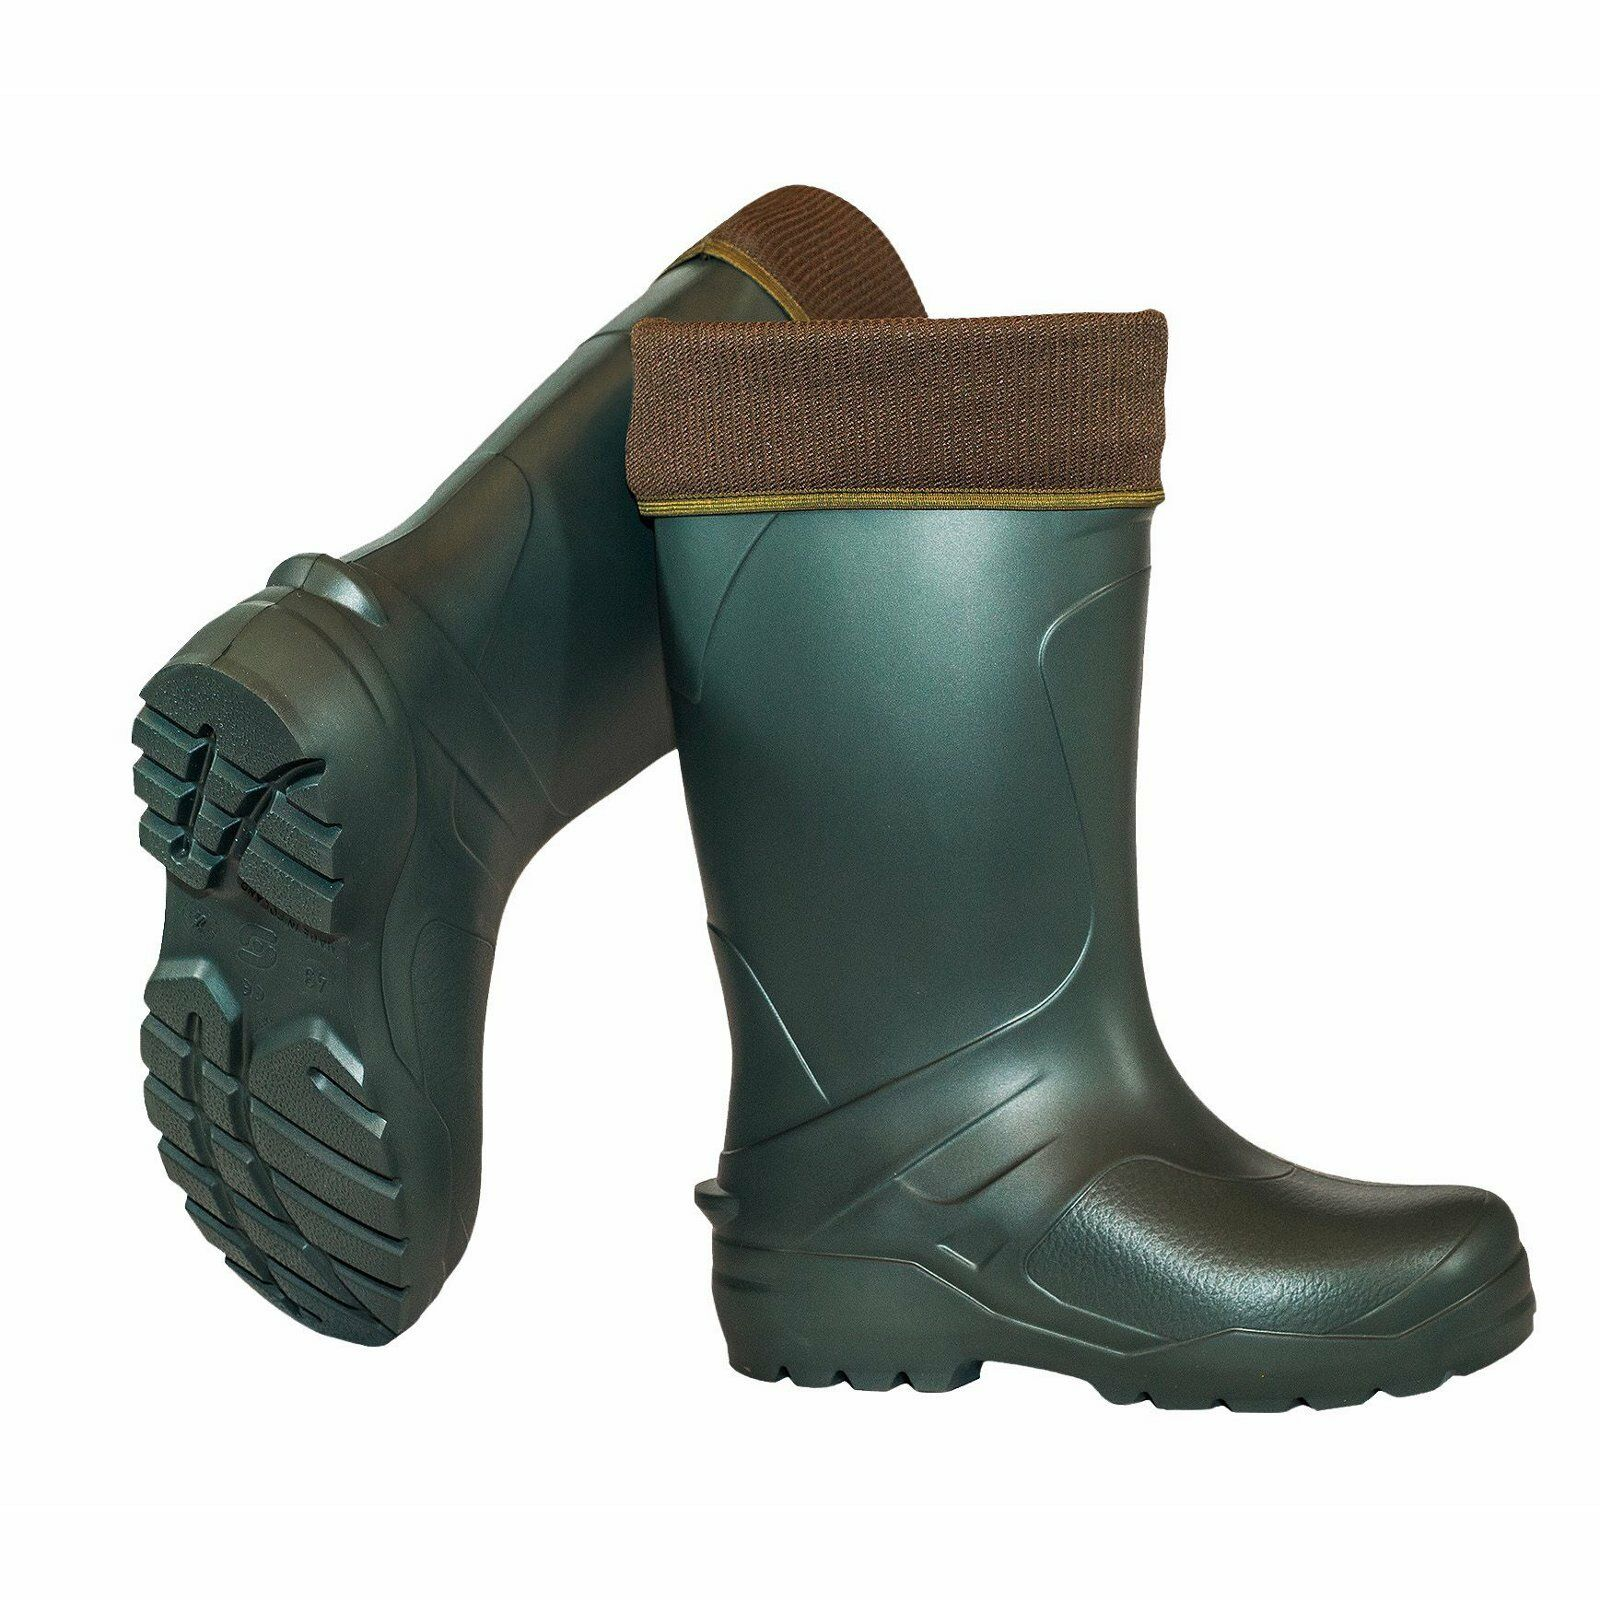 Crosslander Uomo Stivali Vancouver-VERDE - 47 Caldo Scarpe inverno Stivali Uomo Caldo 47 04967f